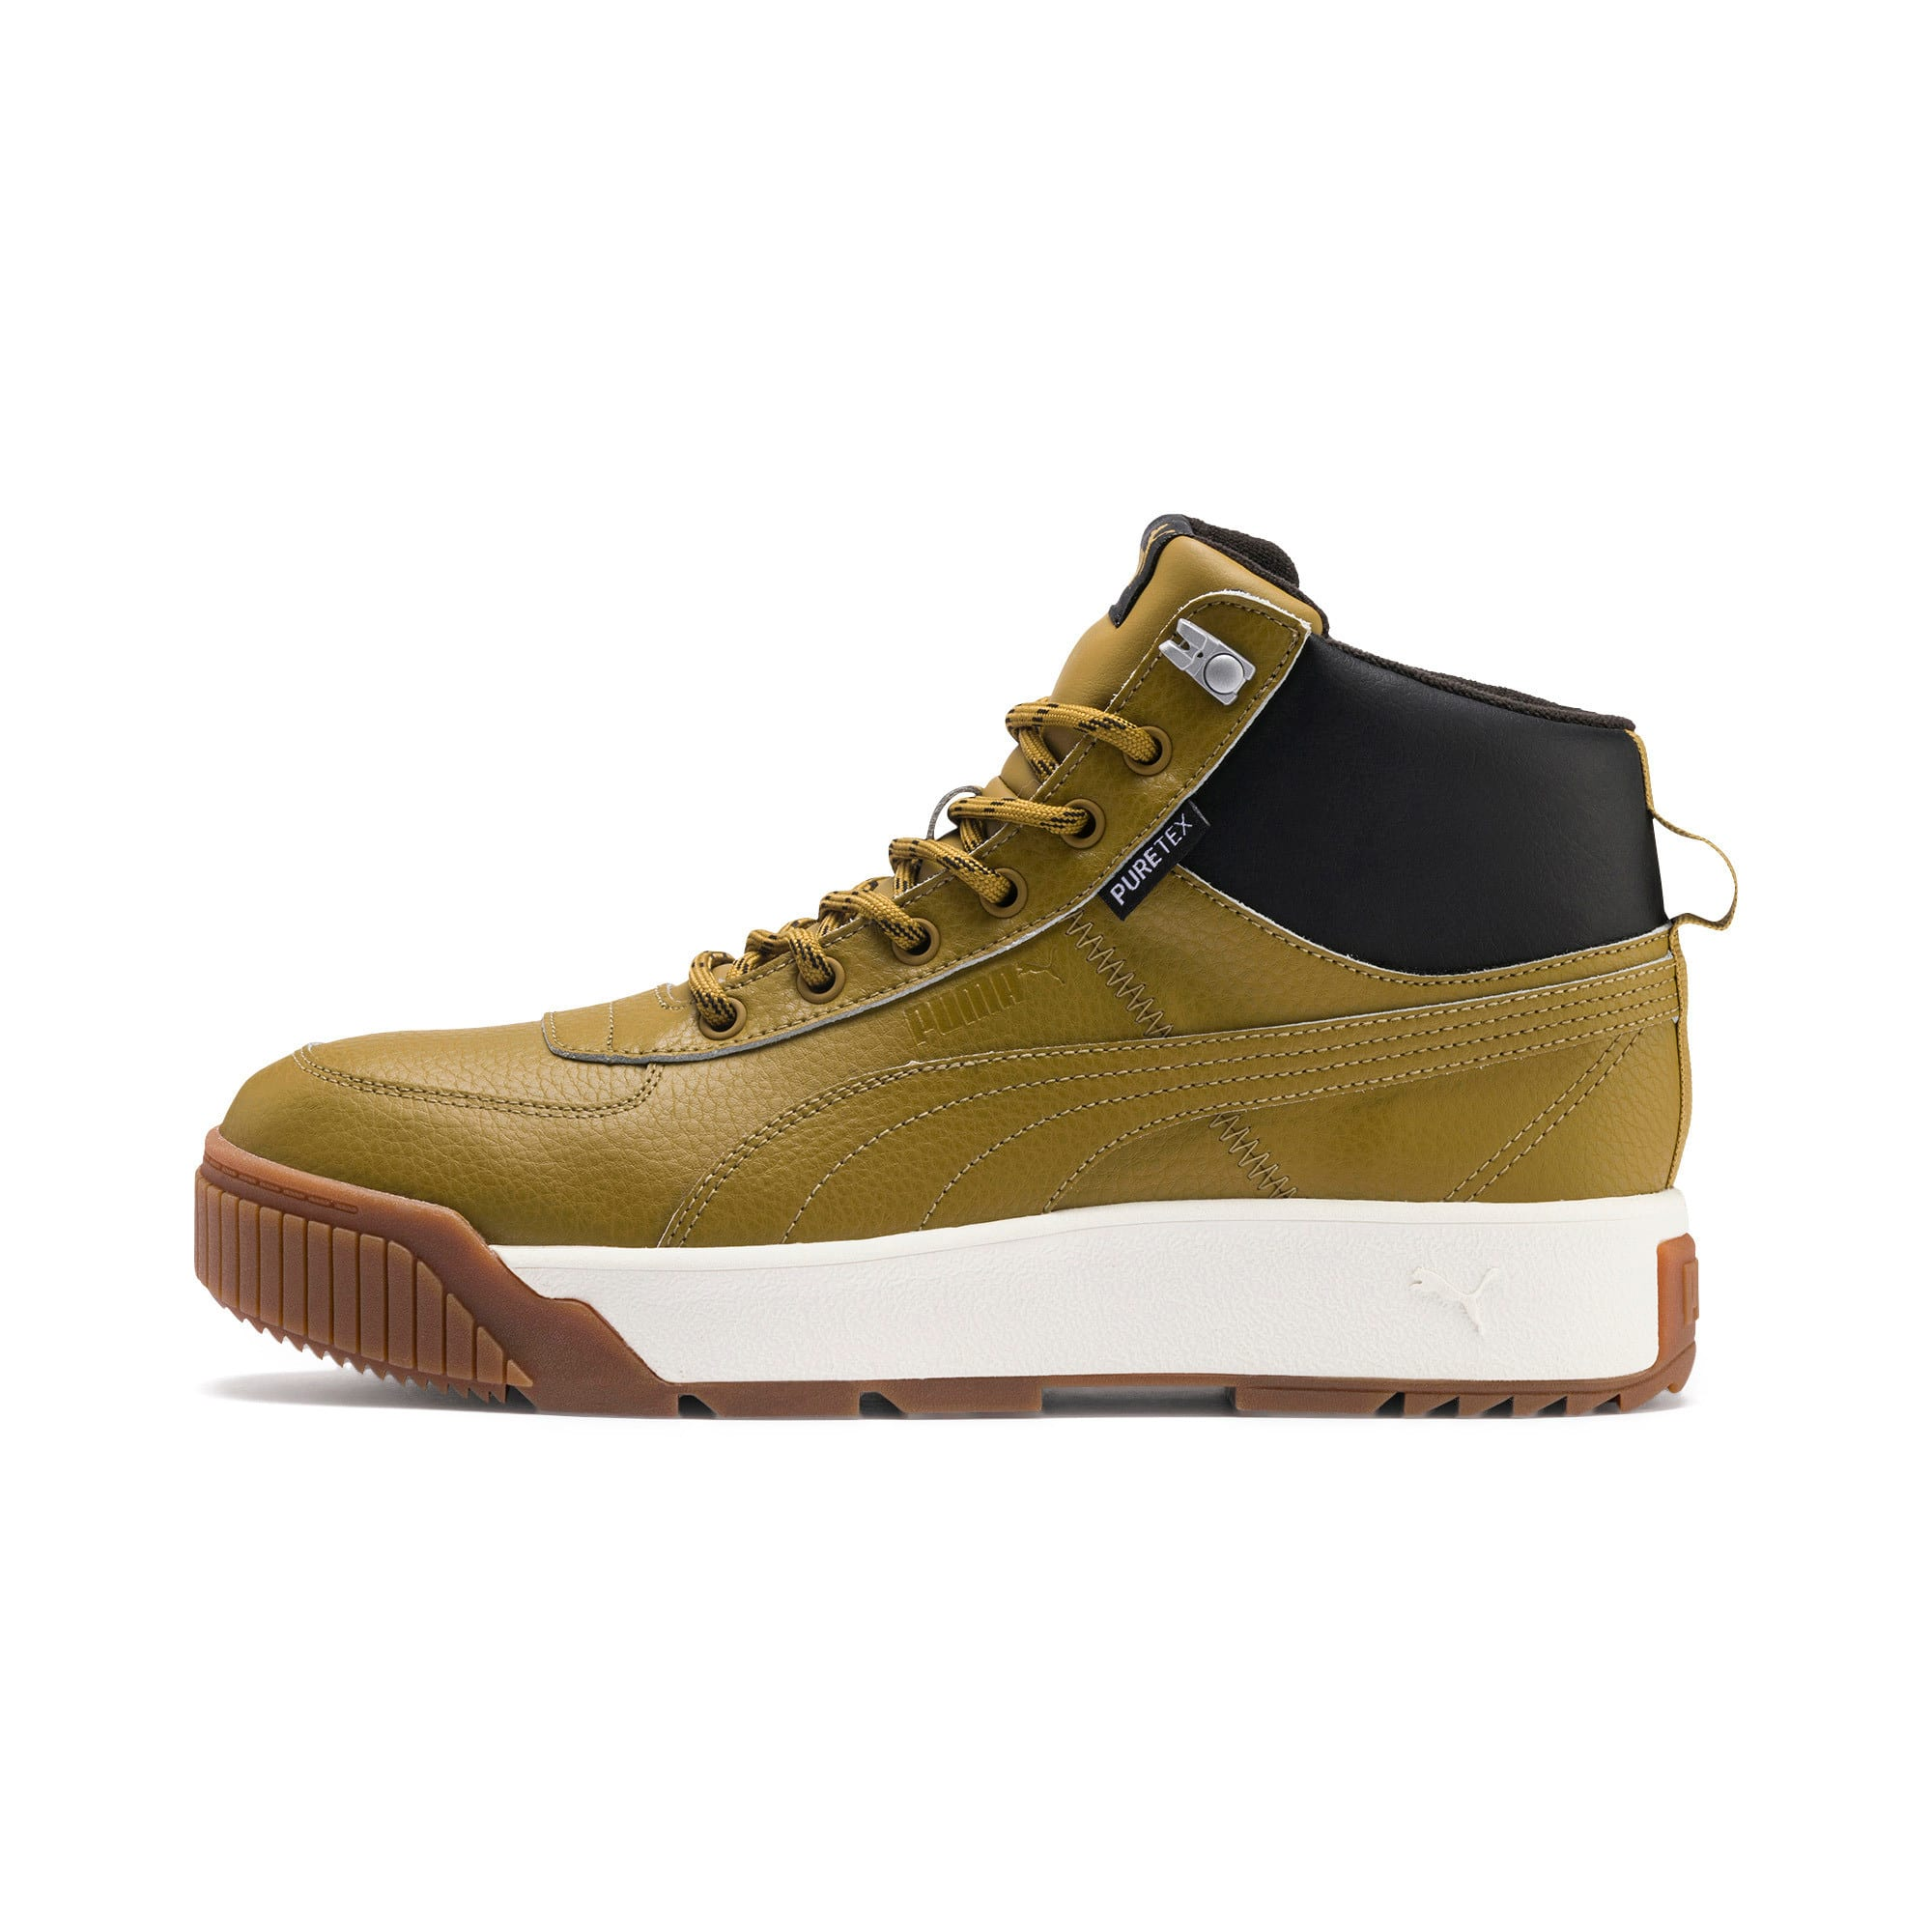 Thumbnail 1 of Tarrenz SB PURETEX Mid Sneakers, Moss Green-Puma Black, medium